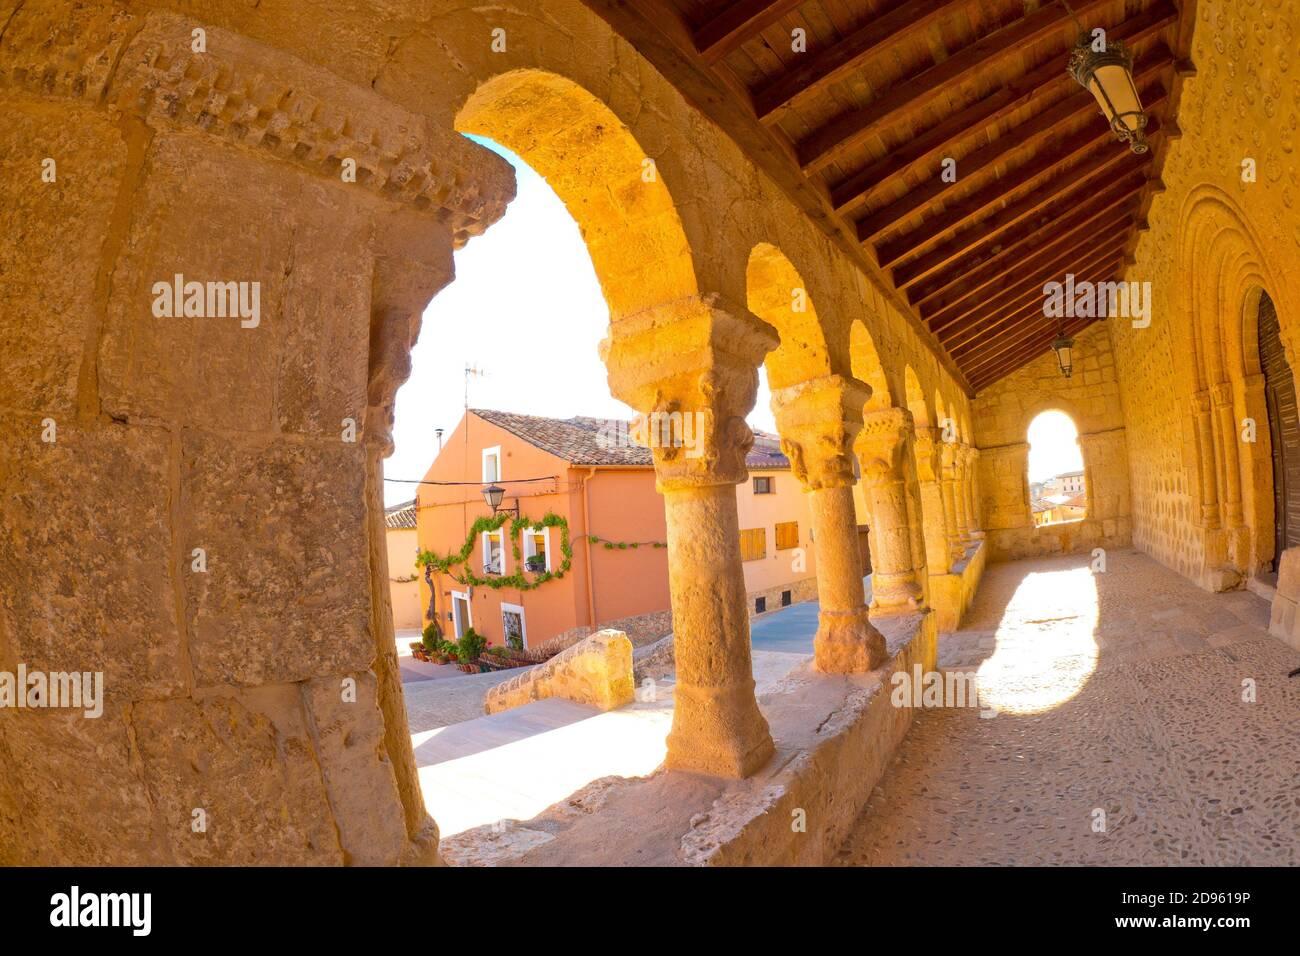 Church of San Miguel, 11th century Romanesque Style, Spanish National Heritage Site, San Esteban de Gormaz, Soria, Castilla y León, Spain, Europe. Stock Photo